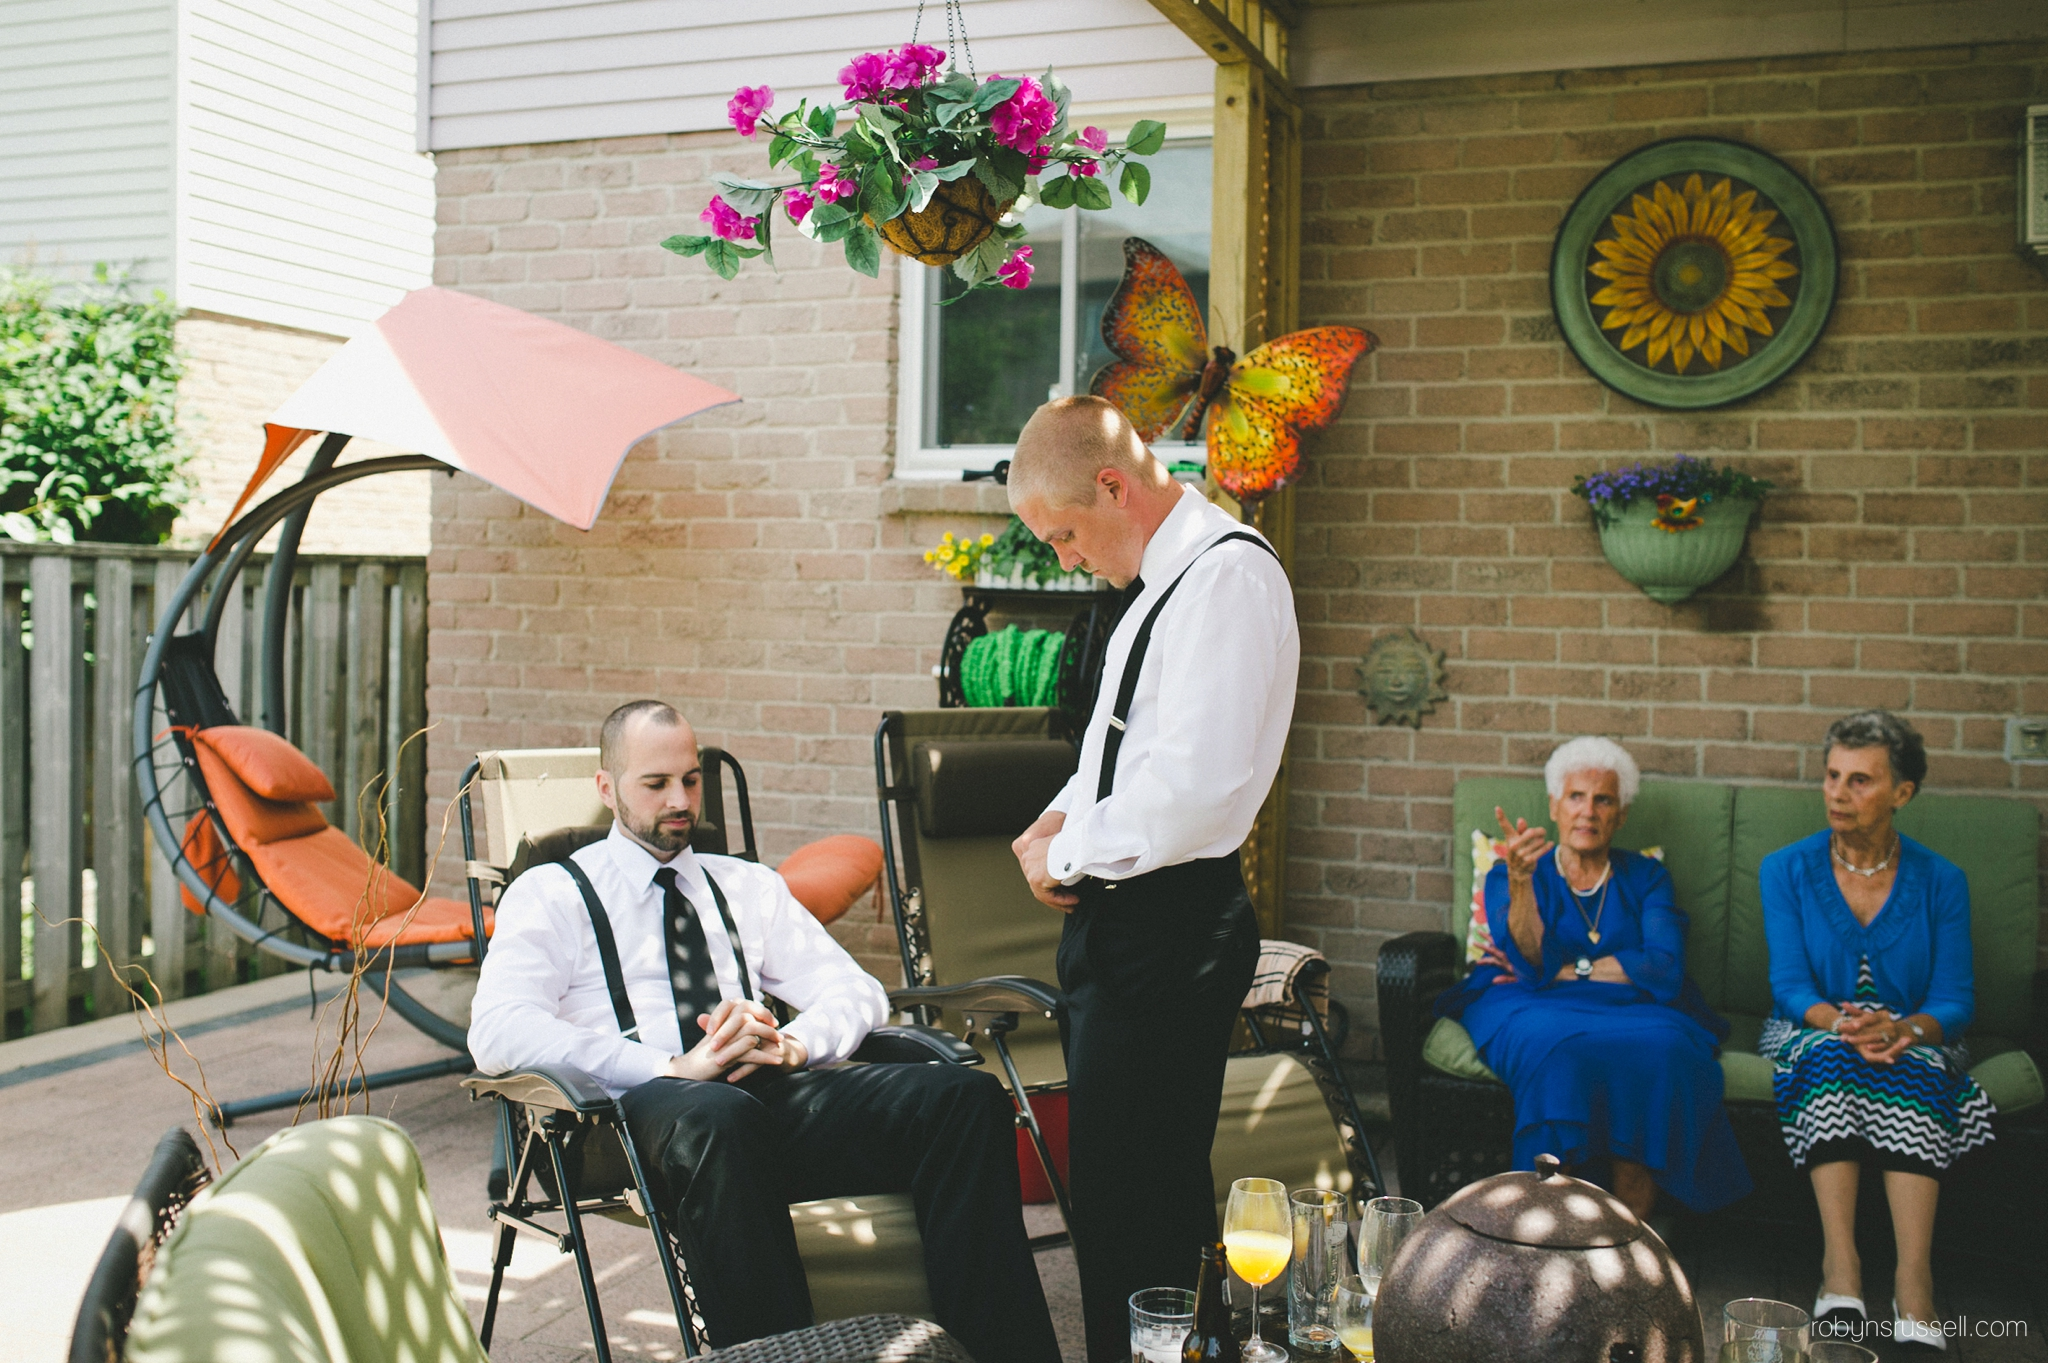 5-photojournalistic-shot-of-groomsmen-relaxing.jpg